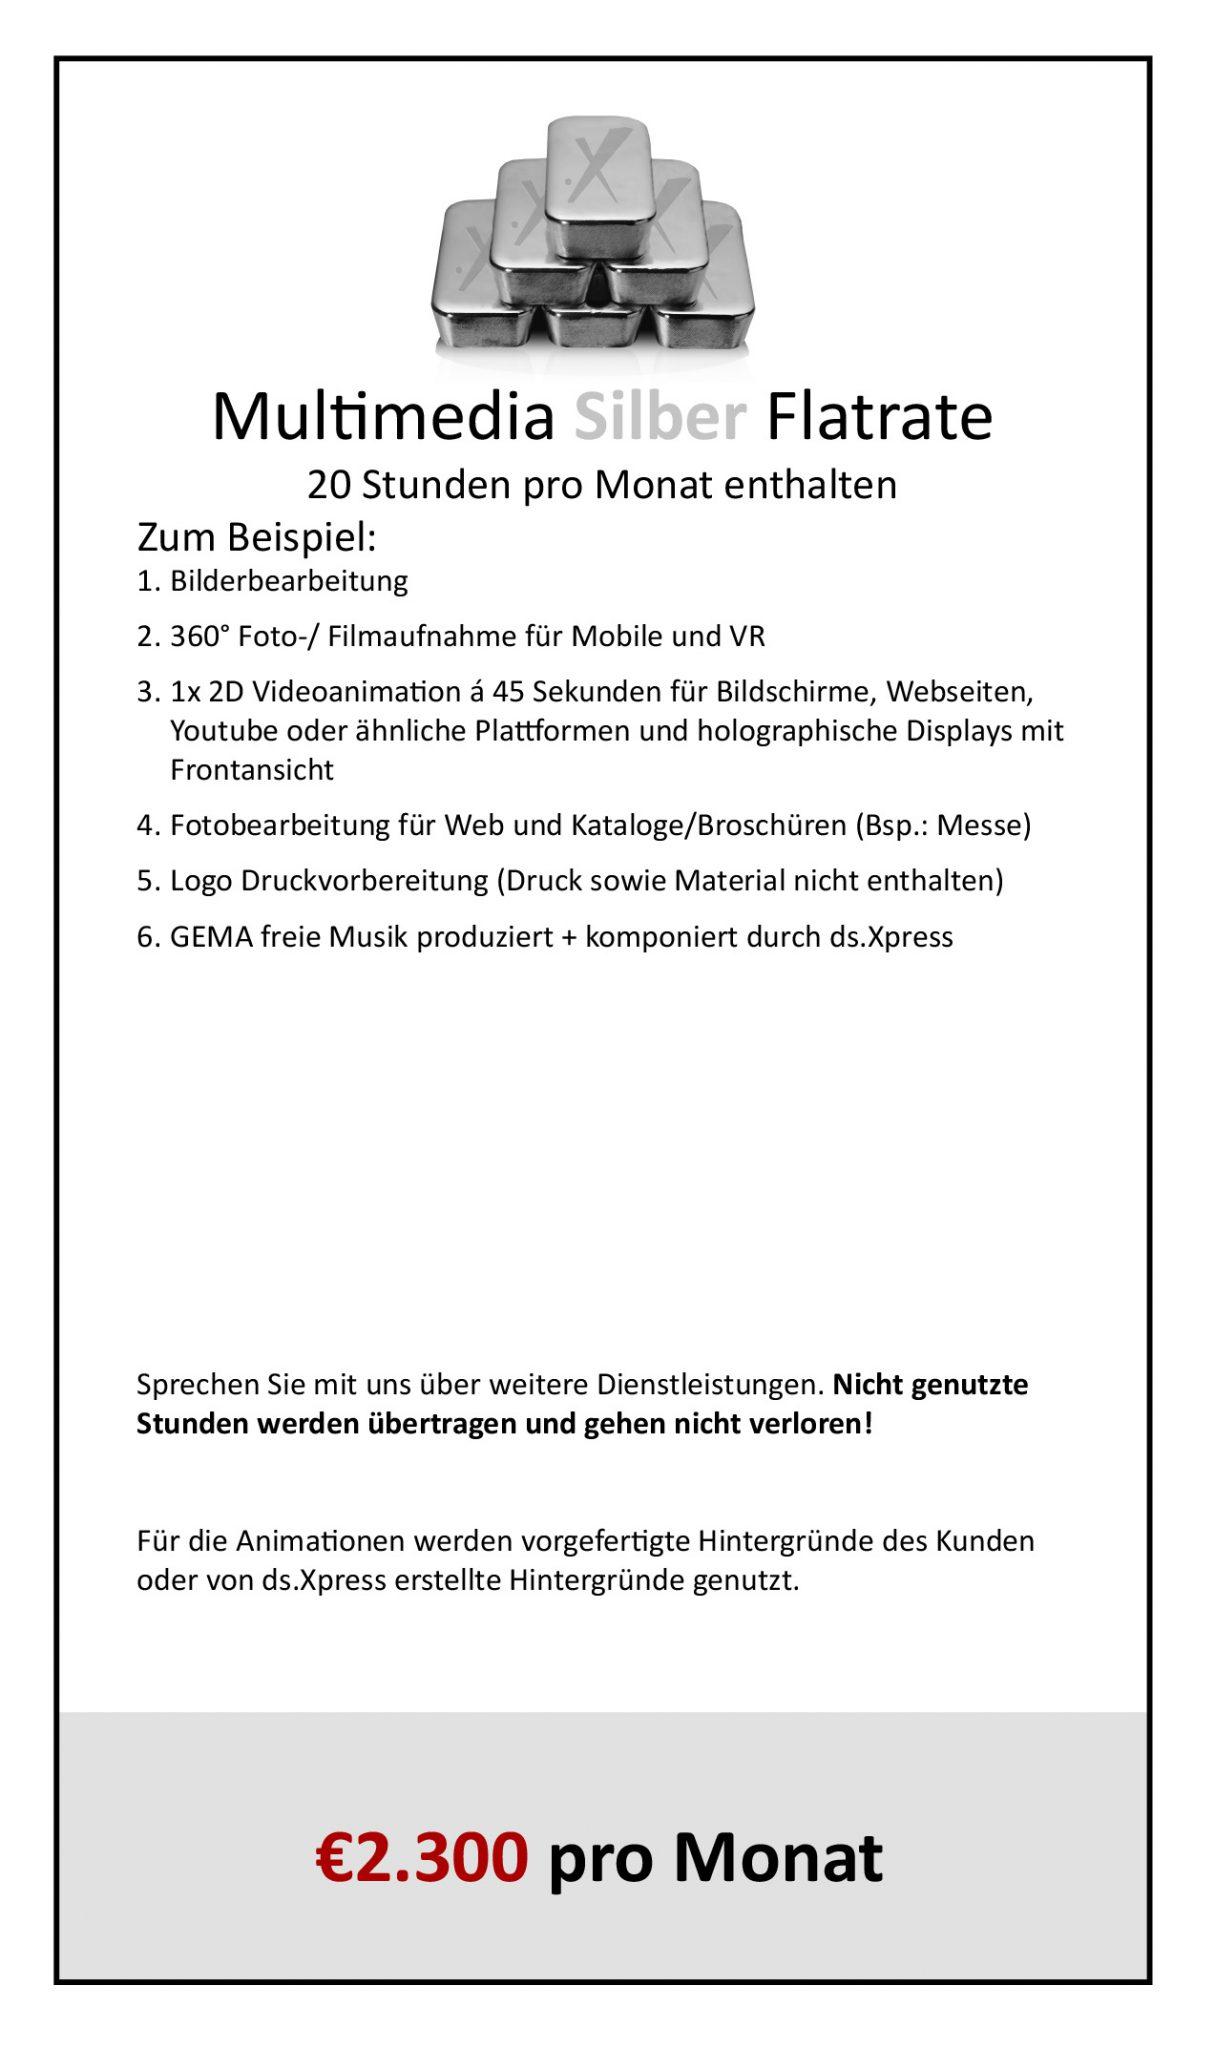 Multimedia Flatrate Silber03